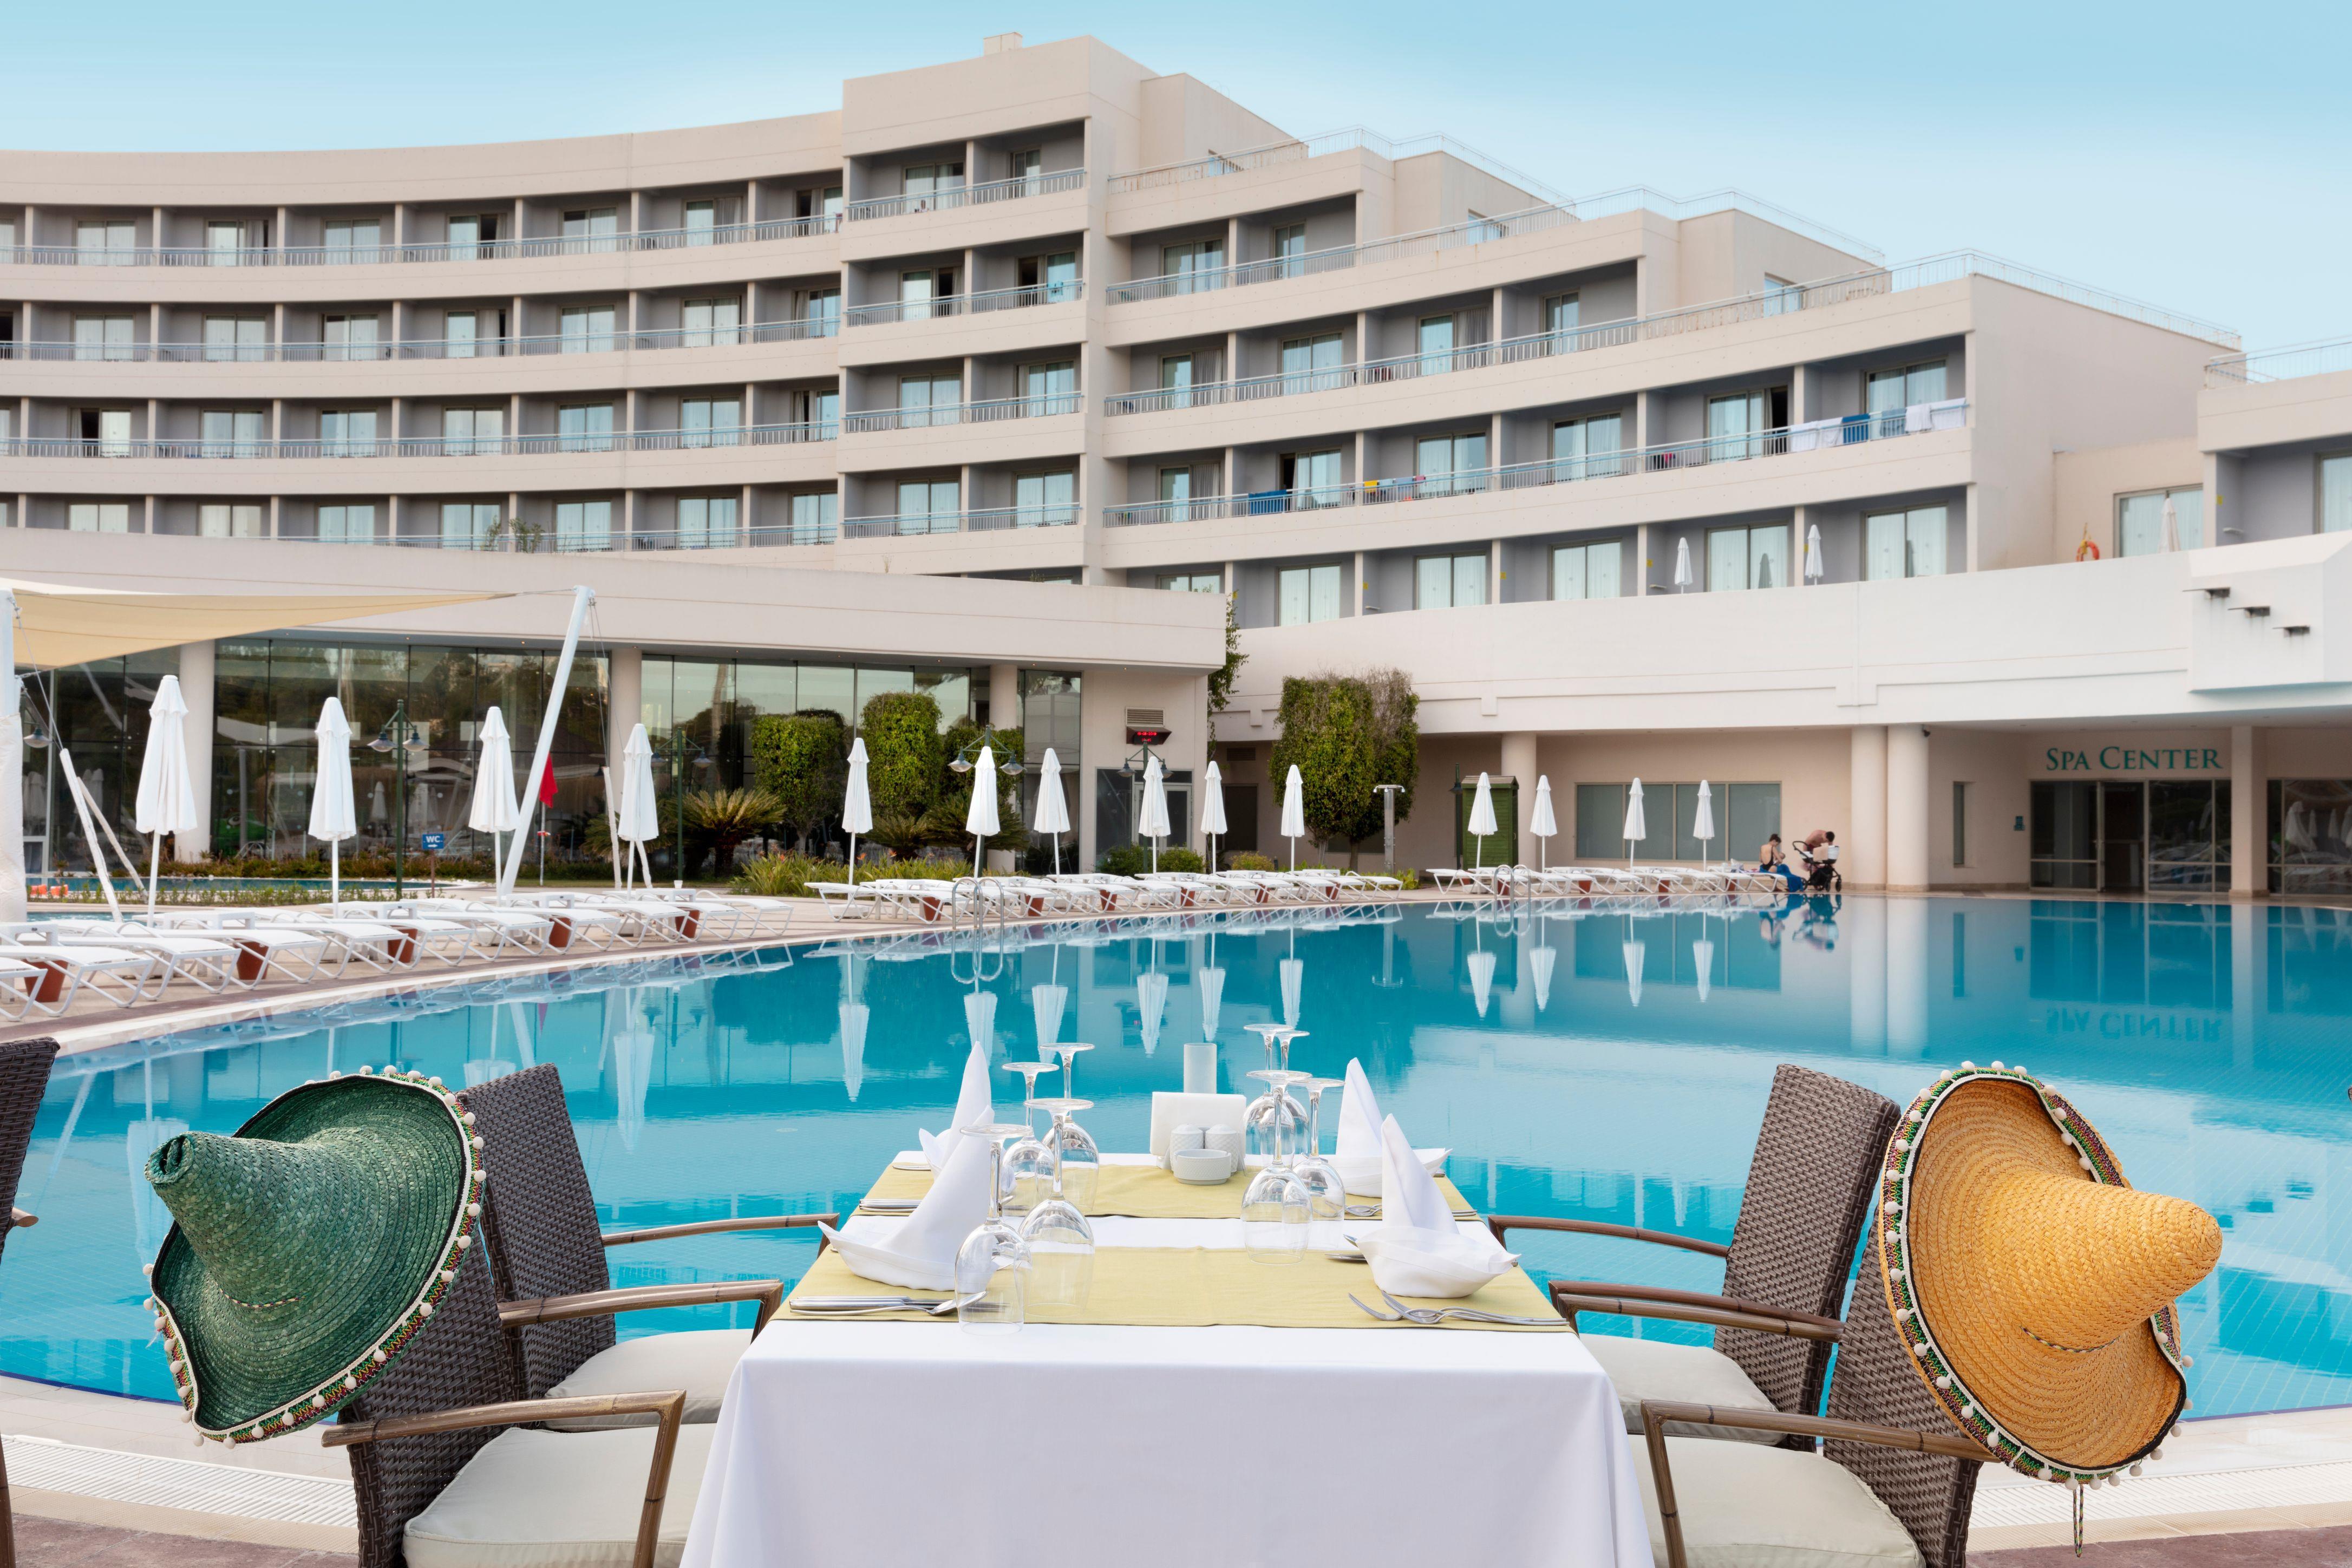 http://www.orextravel.sk/OREX/hotelphotos/zeynep-hotel-general-0018.jpg